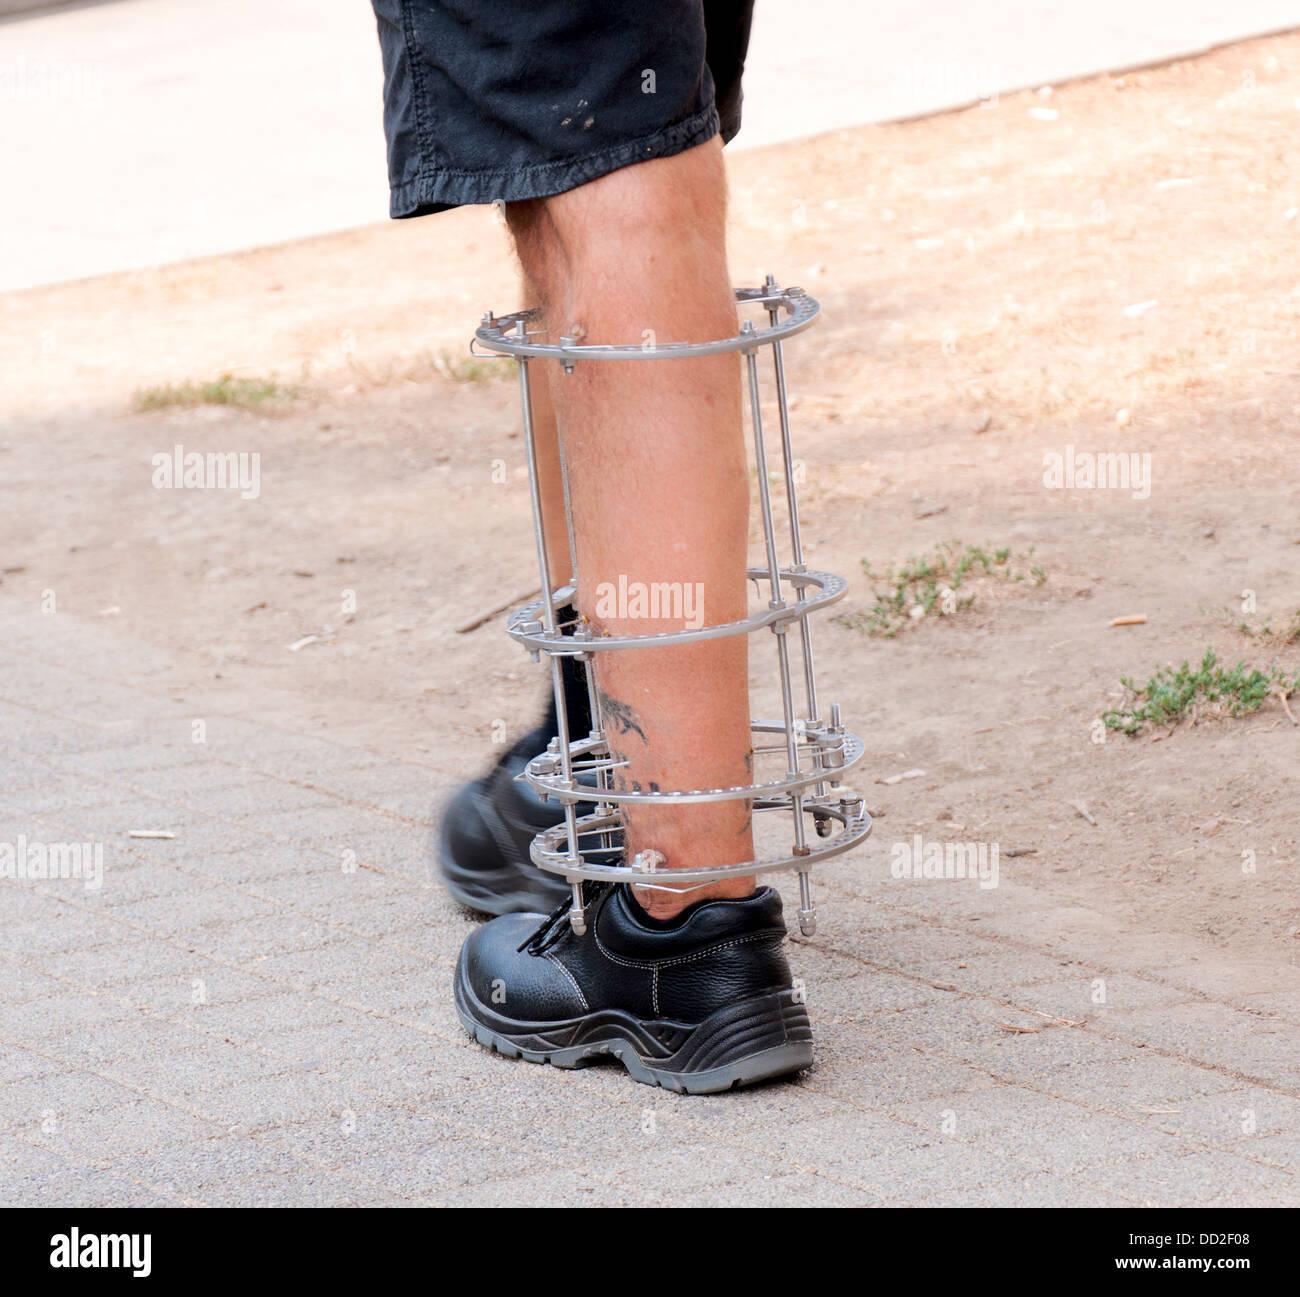 Broken leg with metal bars on it - Stock Image